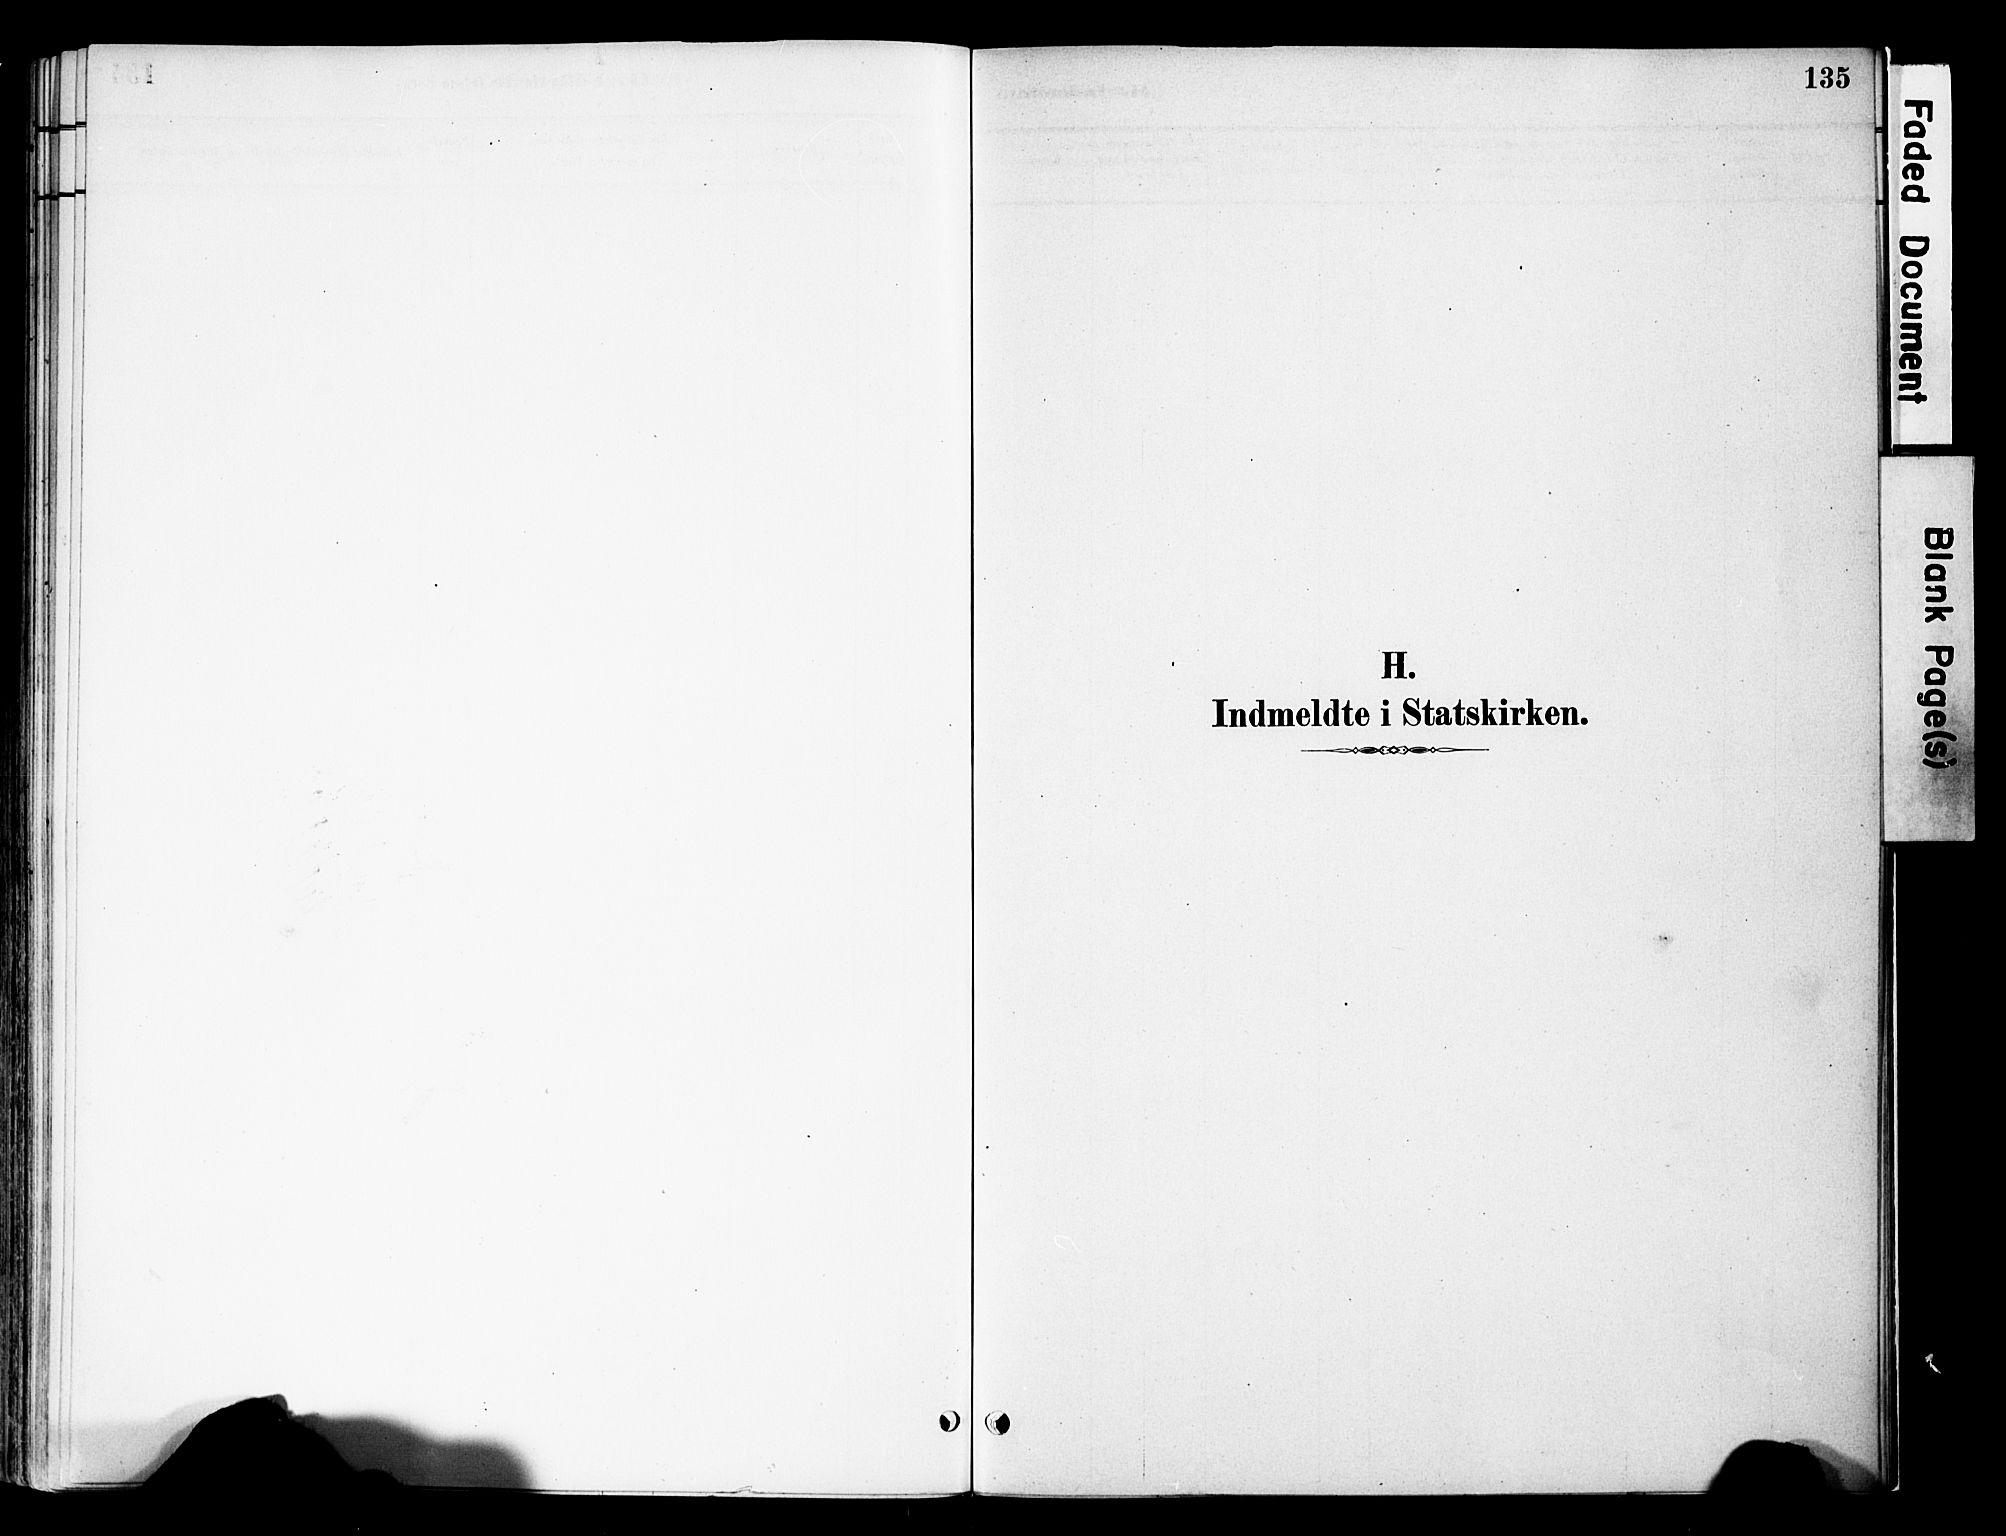 SAH, Vestre Slidre prestekontor, Ministerialbok nr. 5, 1881-1912, s. 135